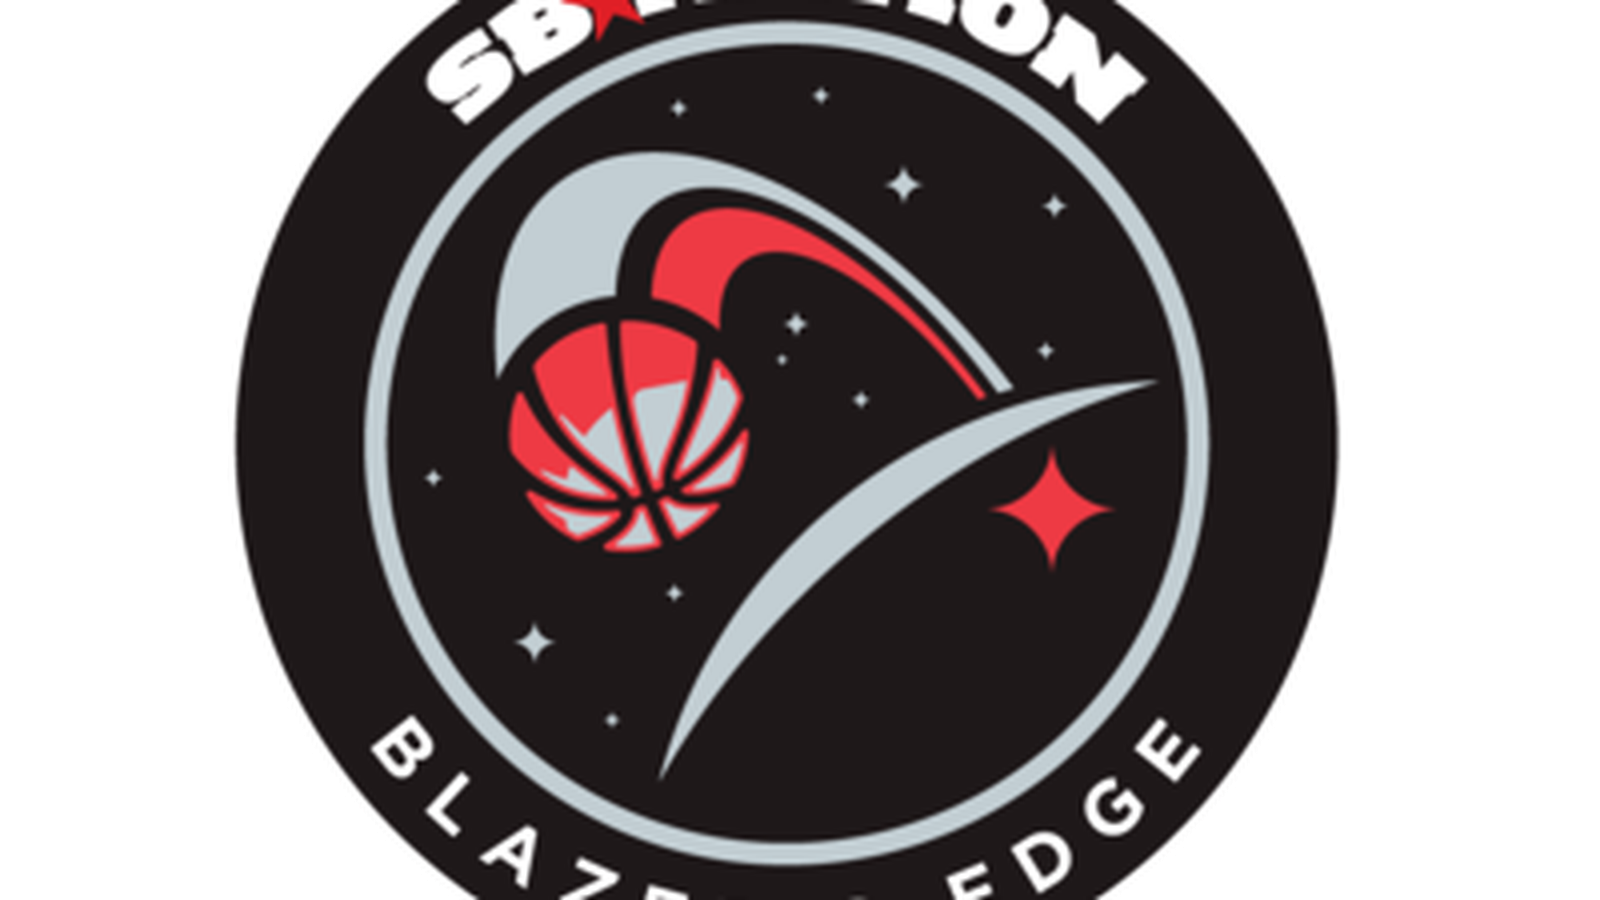 Blazer's Edge Night and Blazer's Edge Looking for New